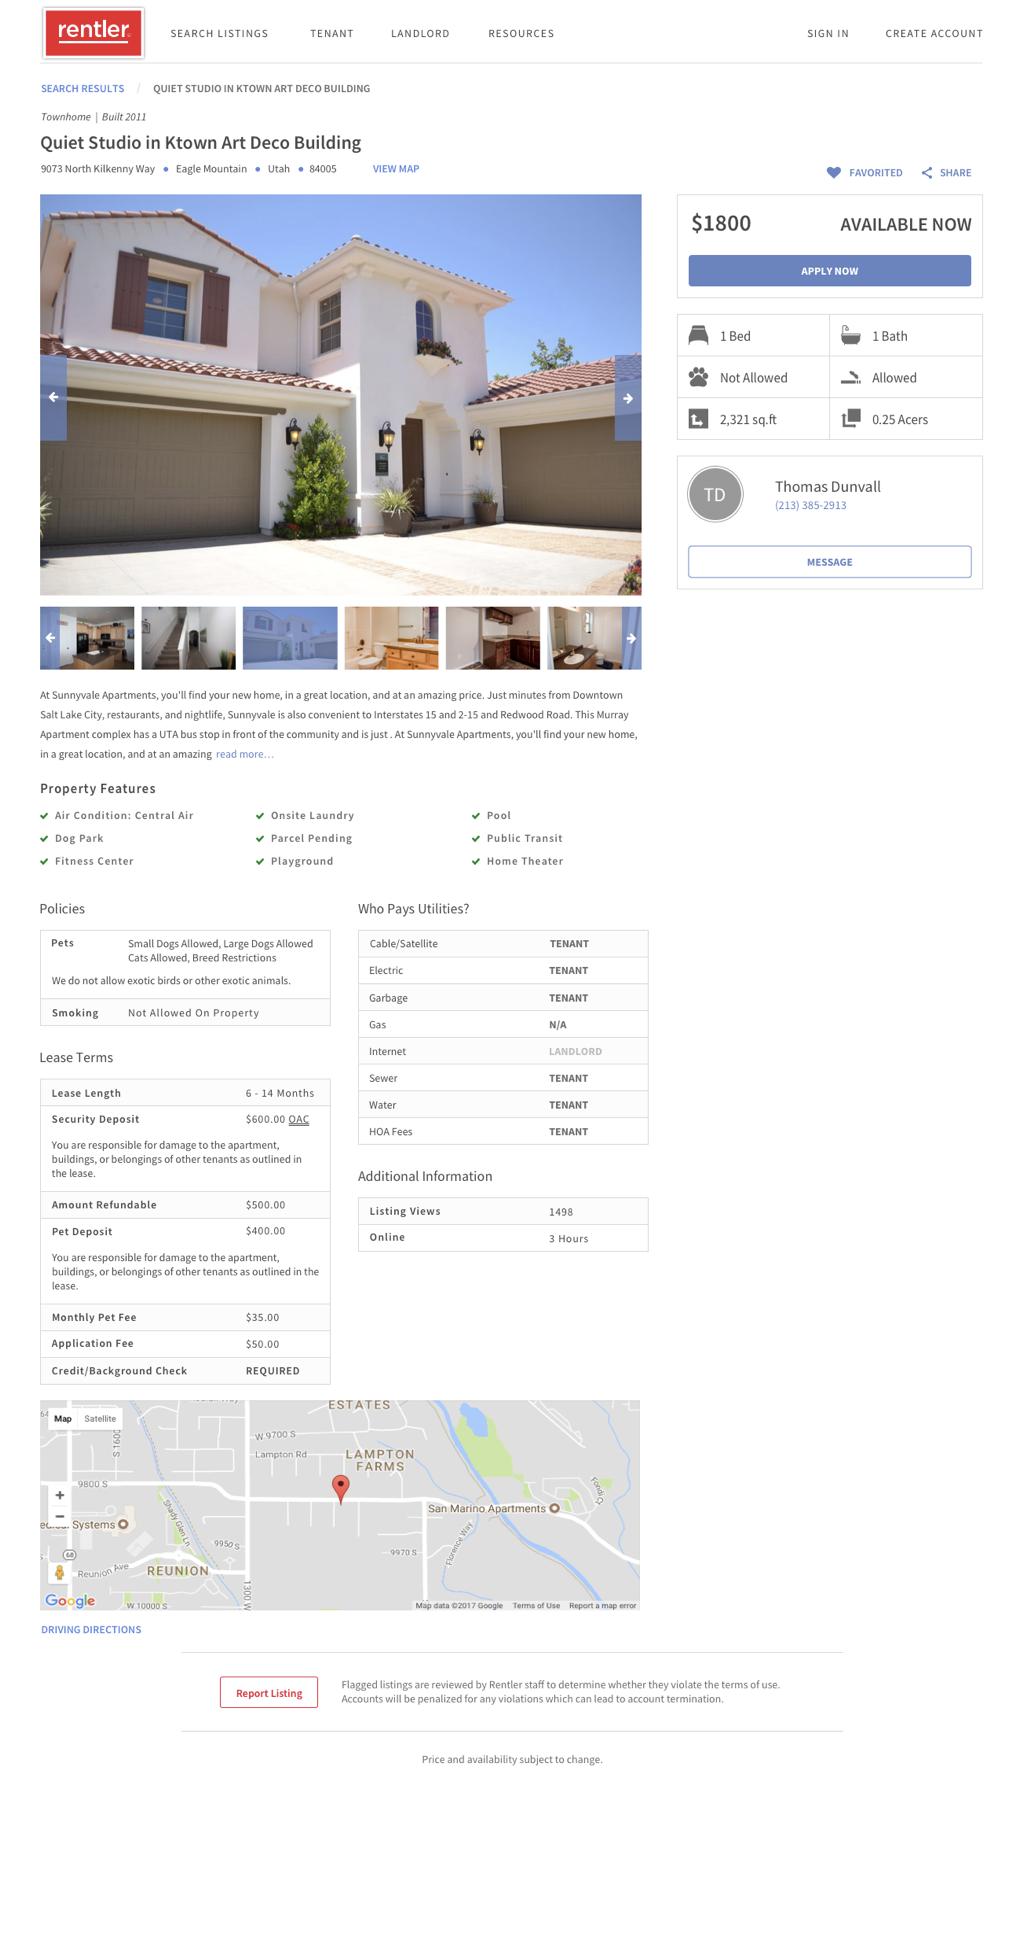 Rentler.com Demo - Property Listings Page on Rentler